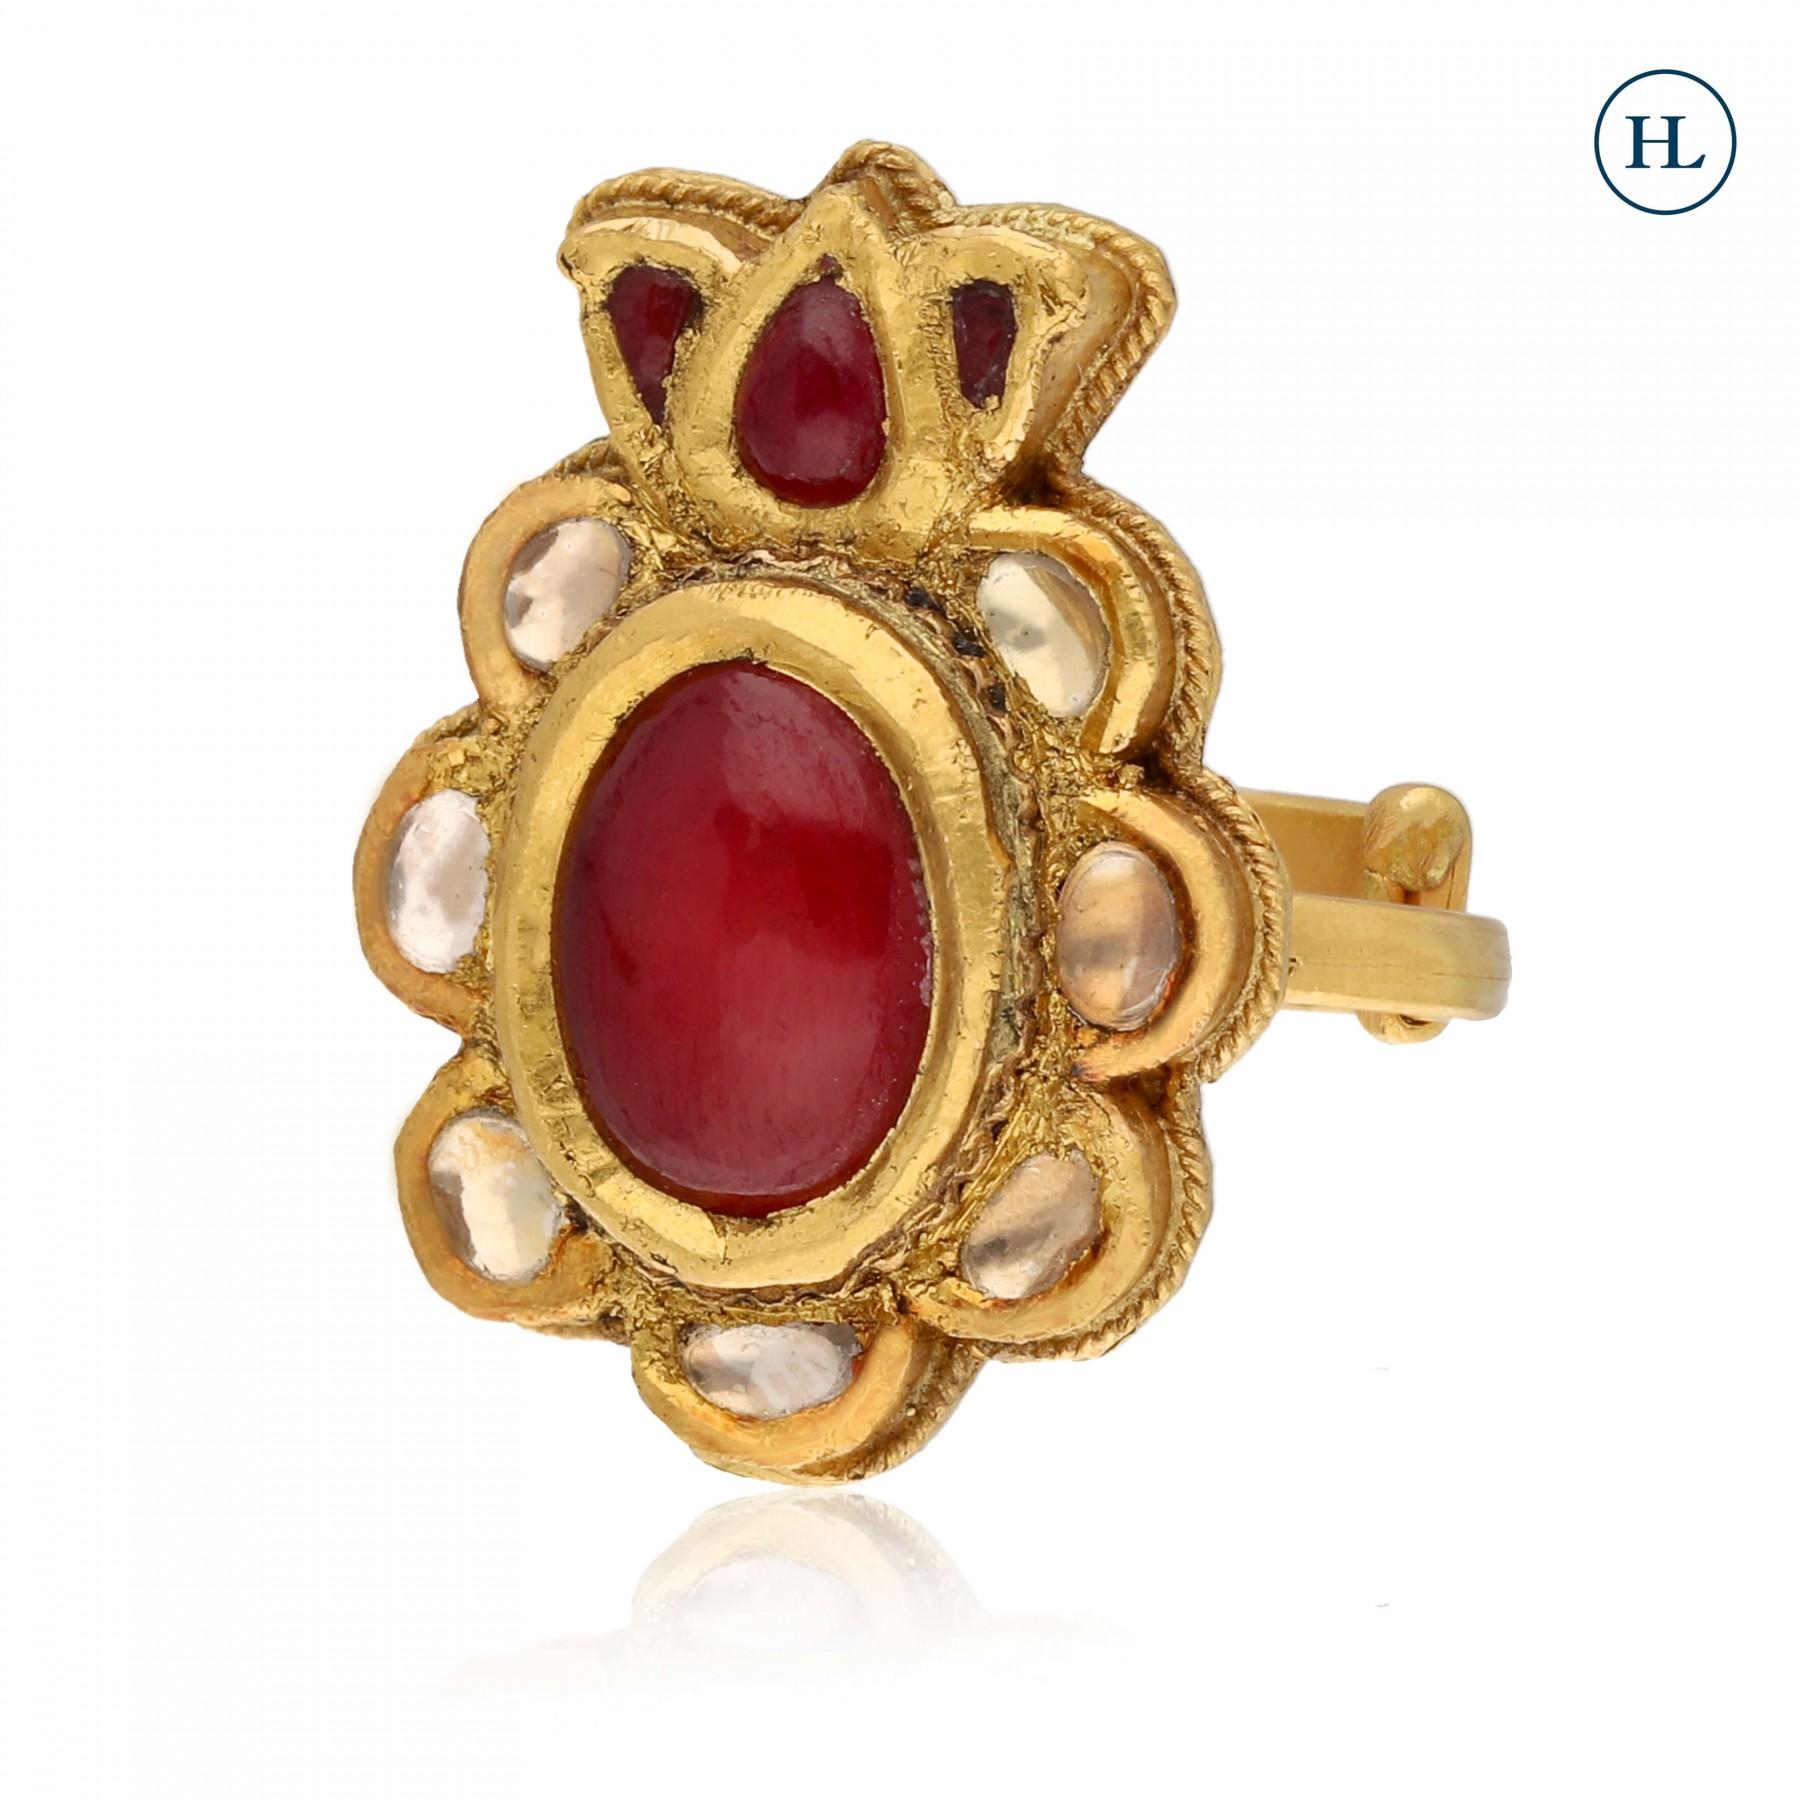 Antique-Styled Gold & Kundan Ring